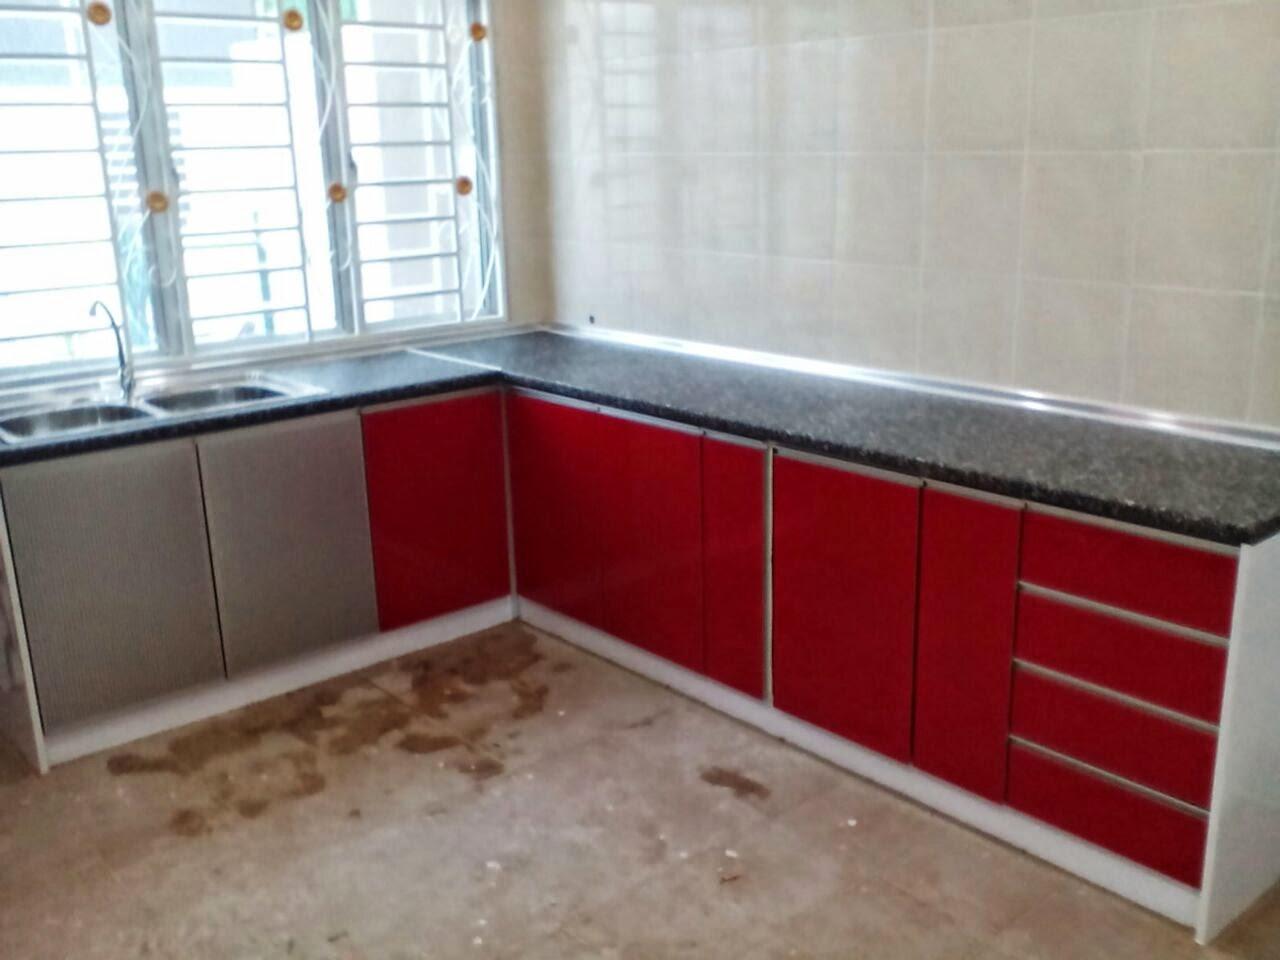 Satu Strategi Pemasaran Iaitu Promosi Kabinet Dapur 4g Gl Merah Dgn Harga Rendah Alhamdulillah Kami Mendapat Tempahan Sehinggakn X Cukup Tangan Nk